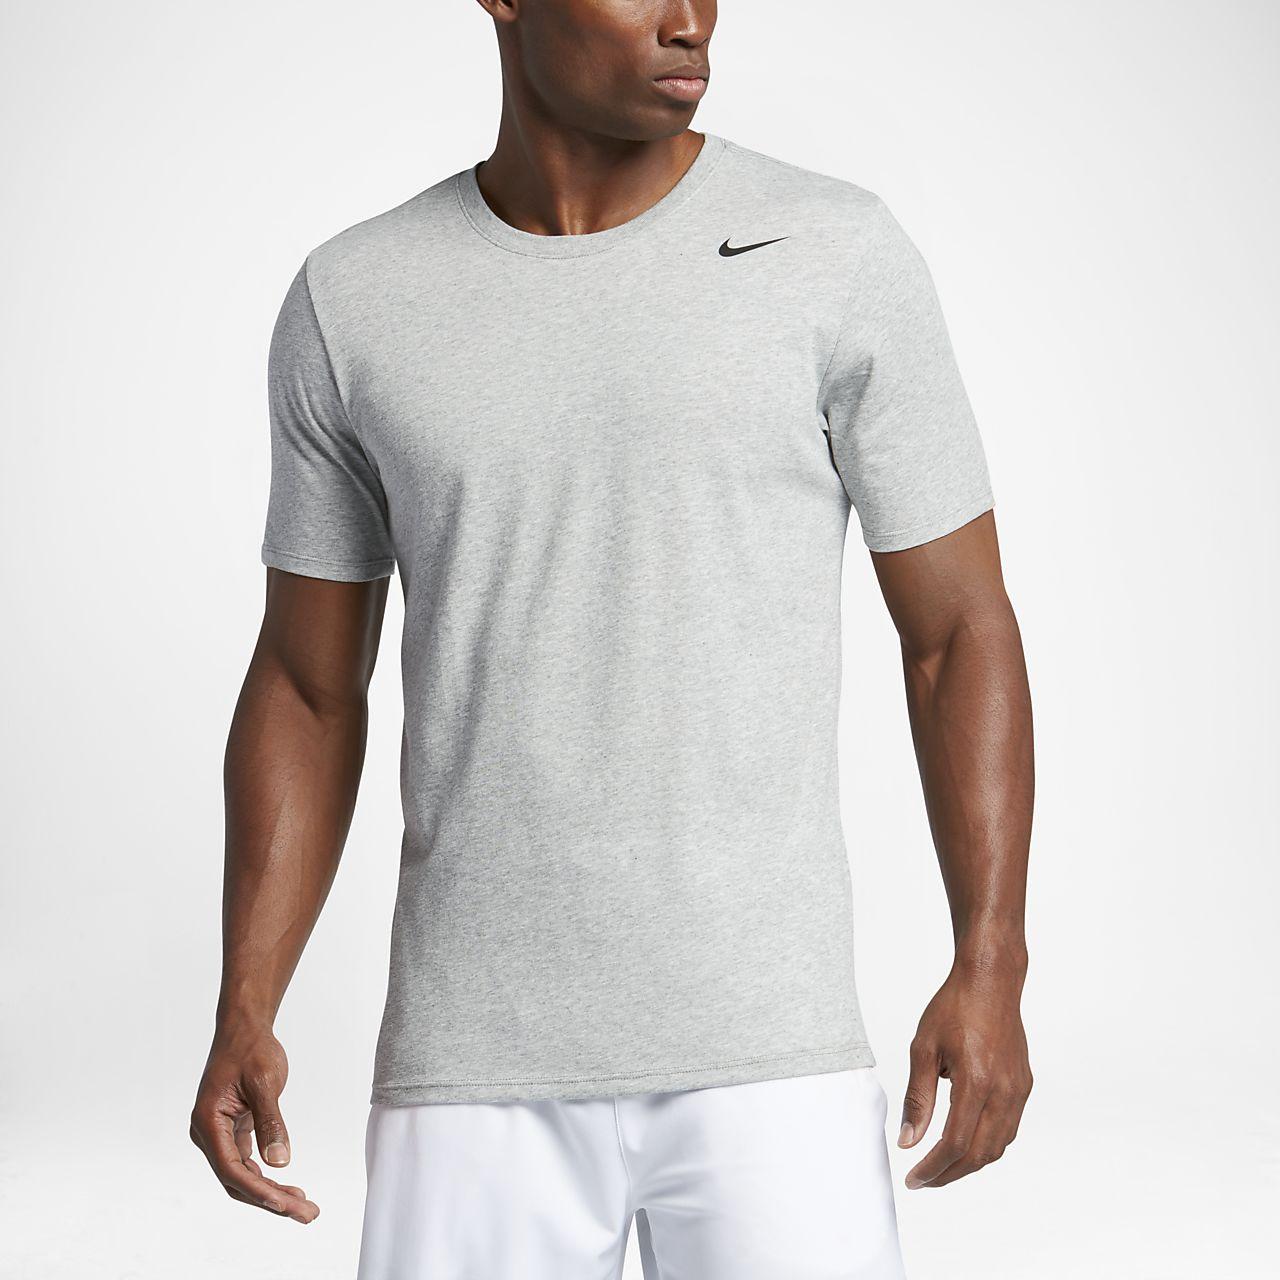 c738aecff514e Playera de manga corta de entrenamiento para hombre Nike Dri-FIT ...